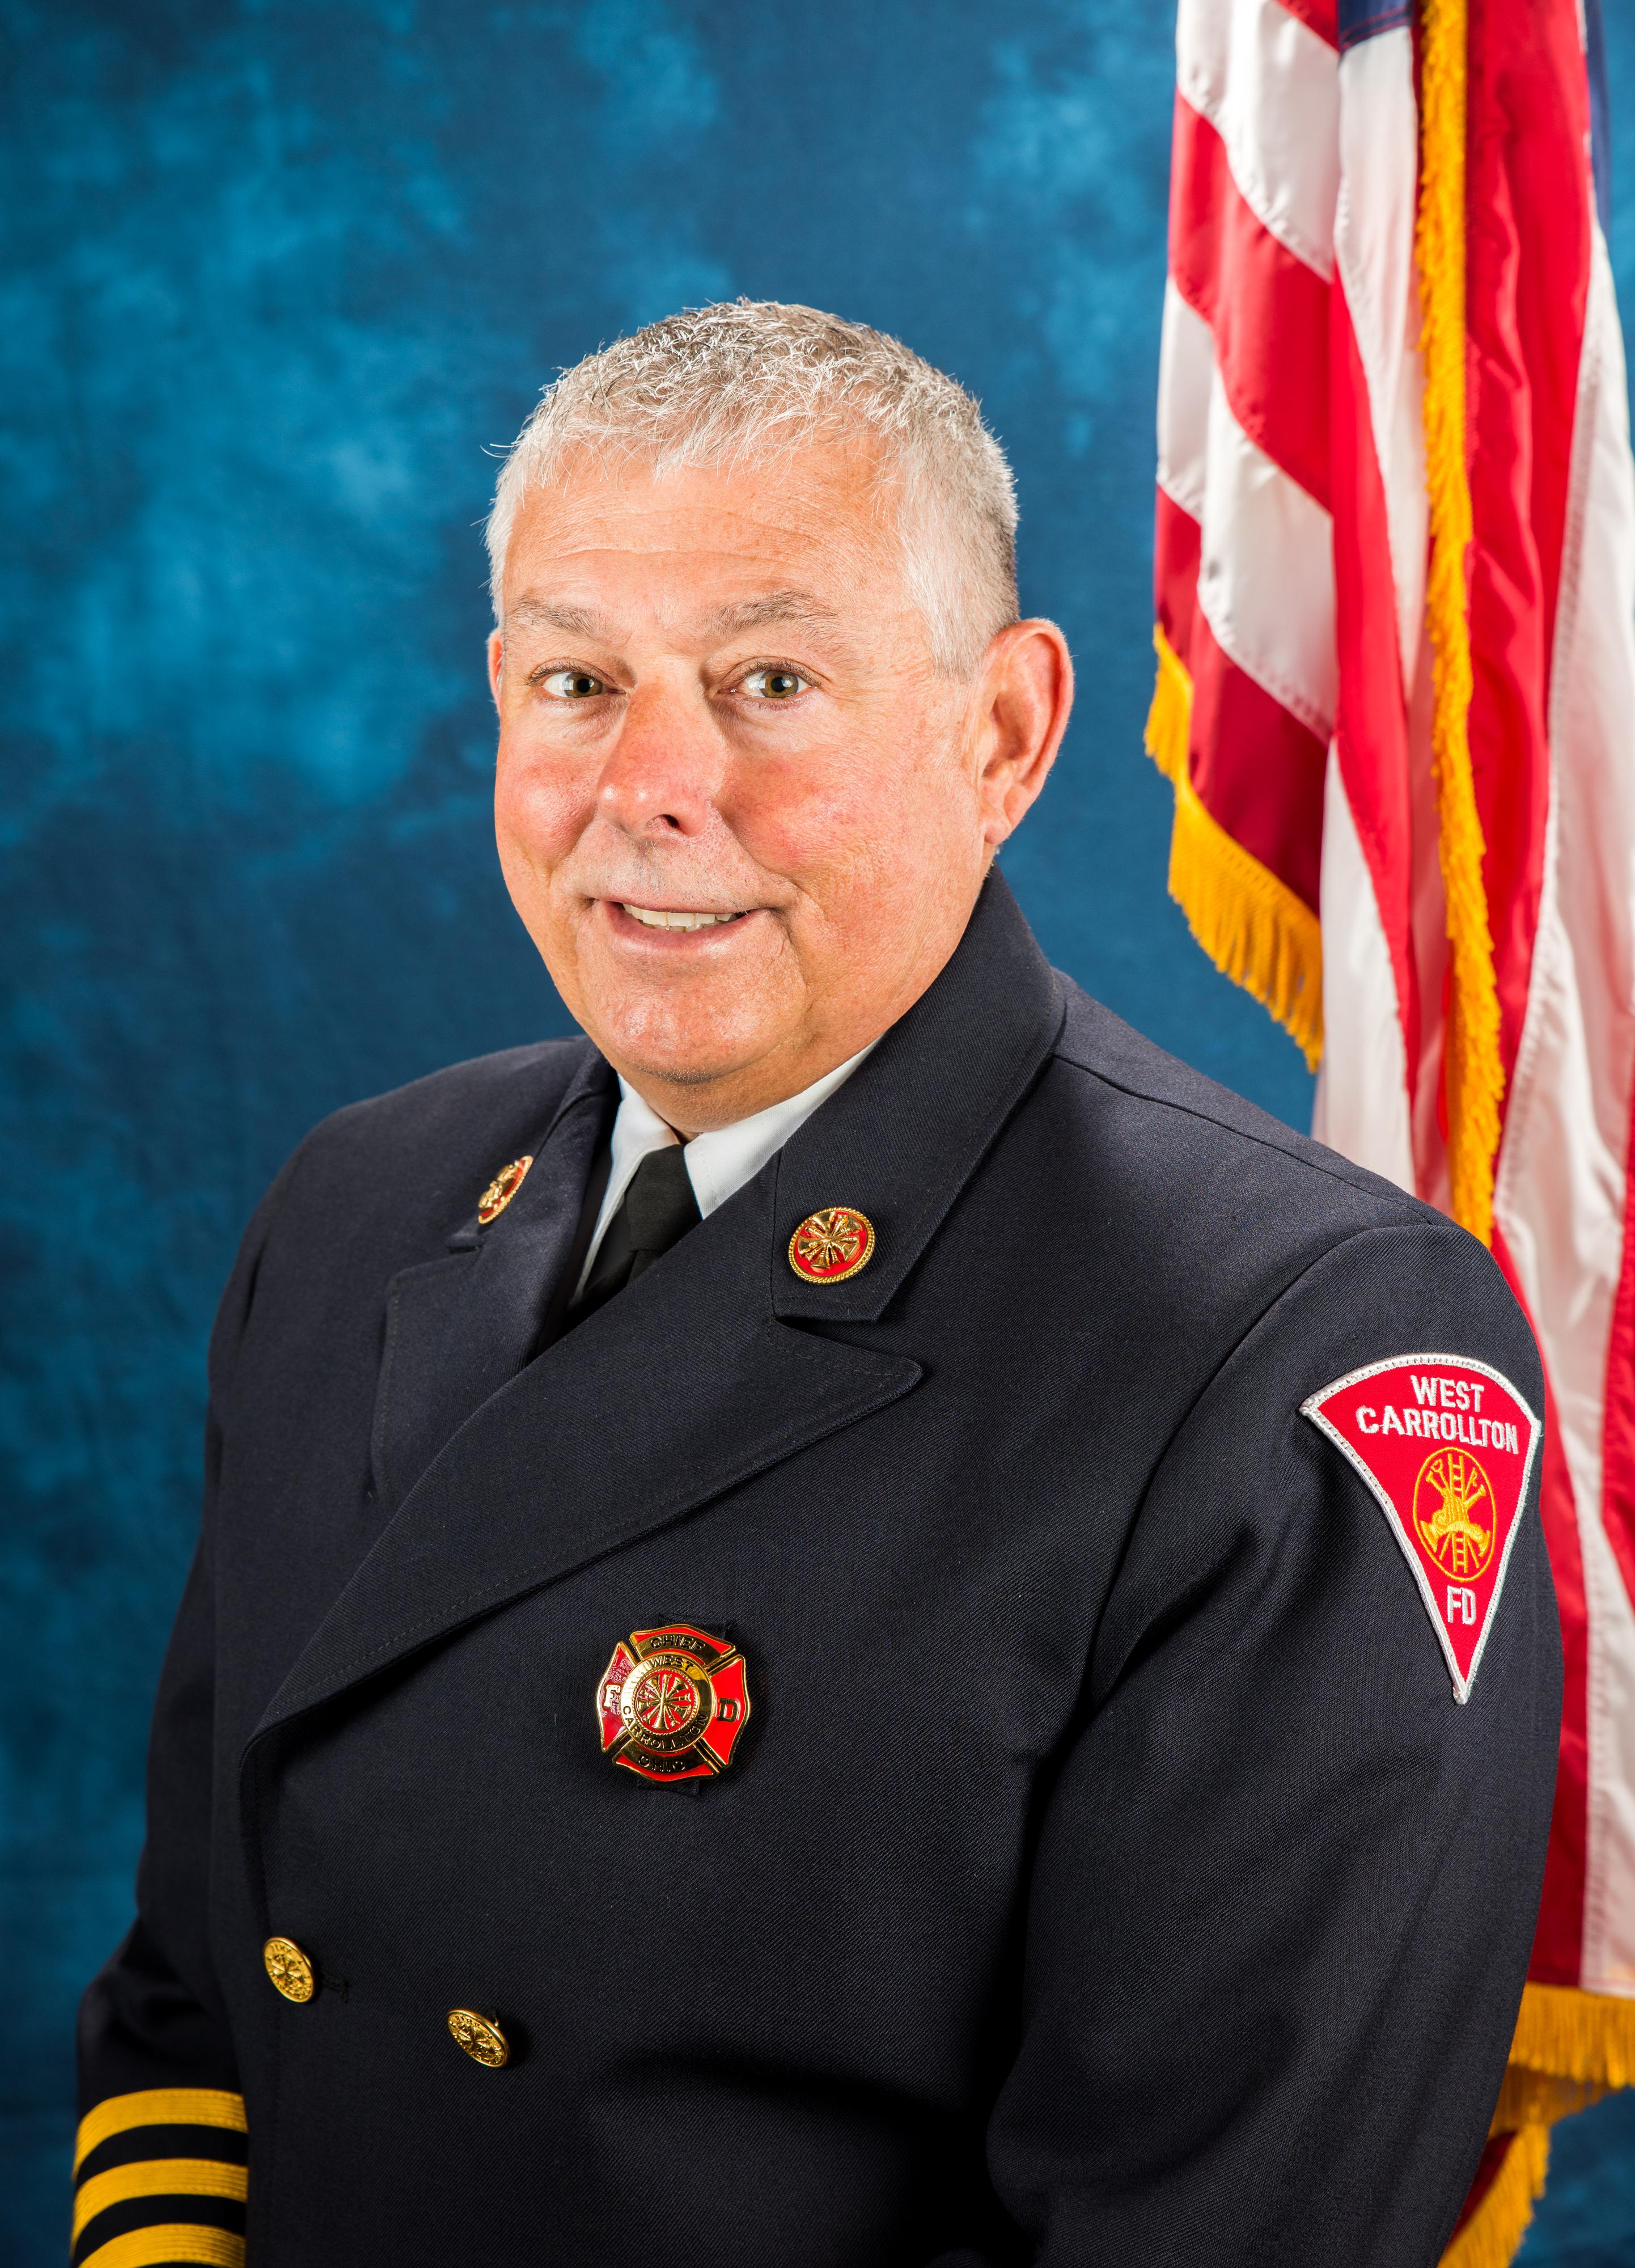 Fire Chief Chris Barnett